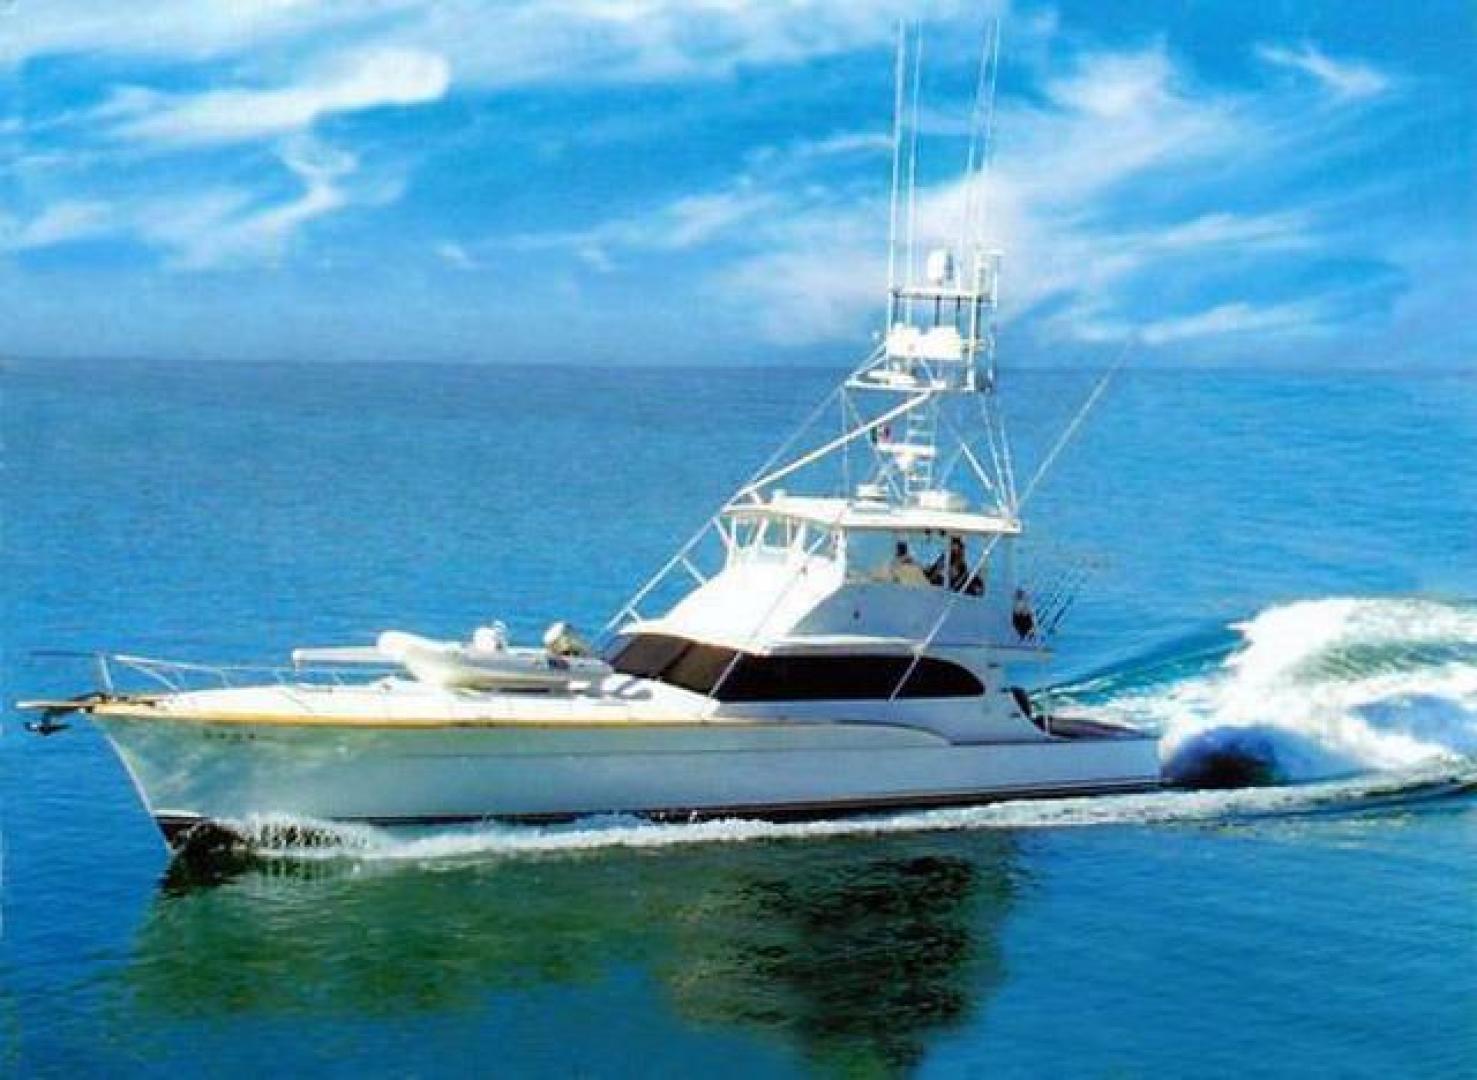 Buddy Davis-Sport Fishing Motor Yacht 1982-Rama III La Paz-Mexico-Profile-387253 | Thumbnail